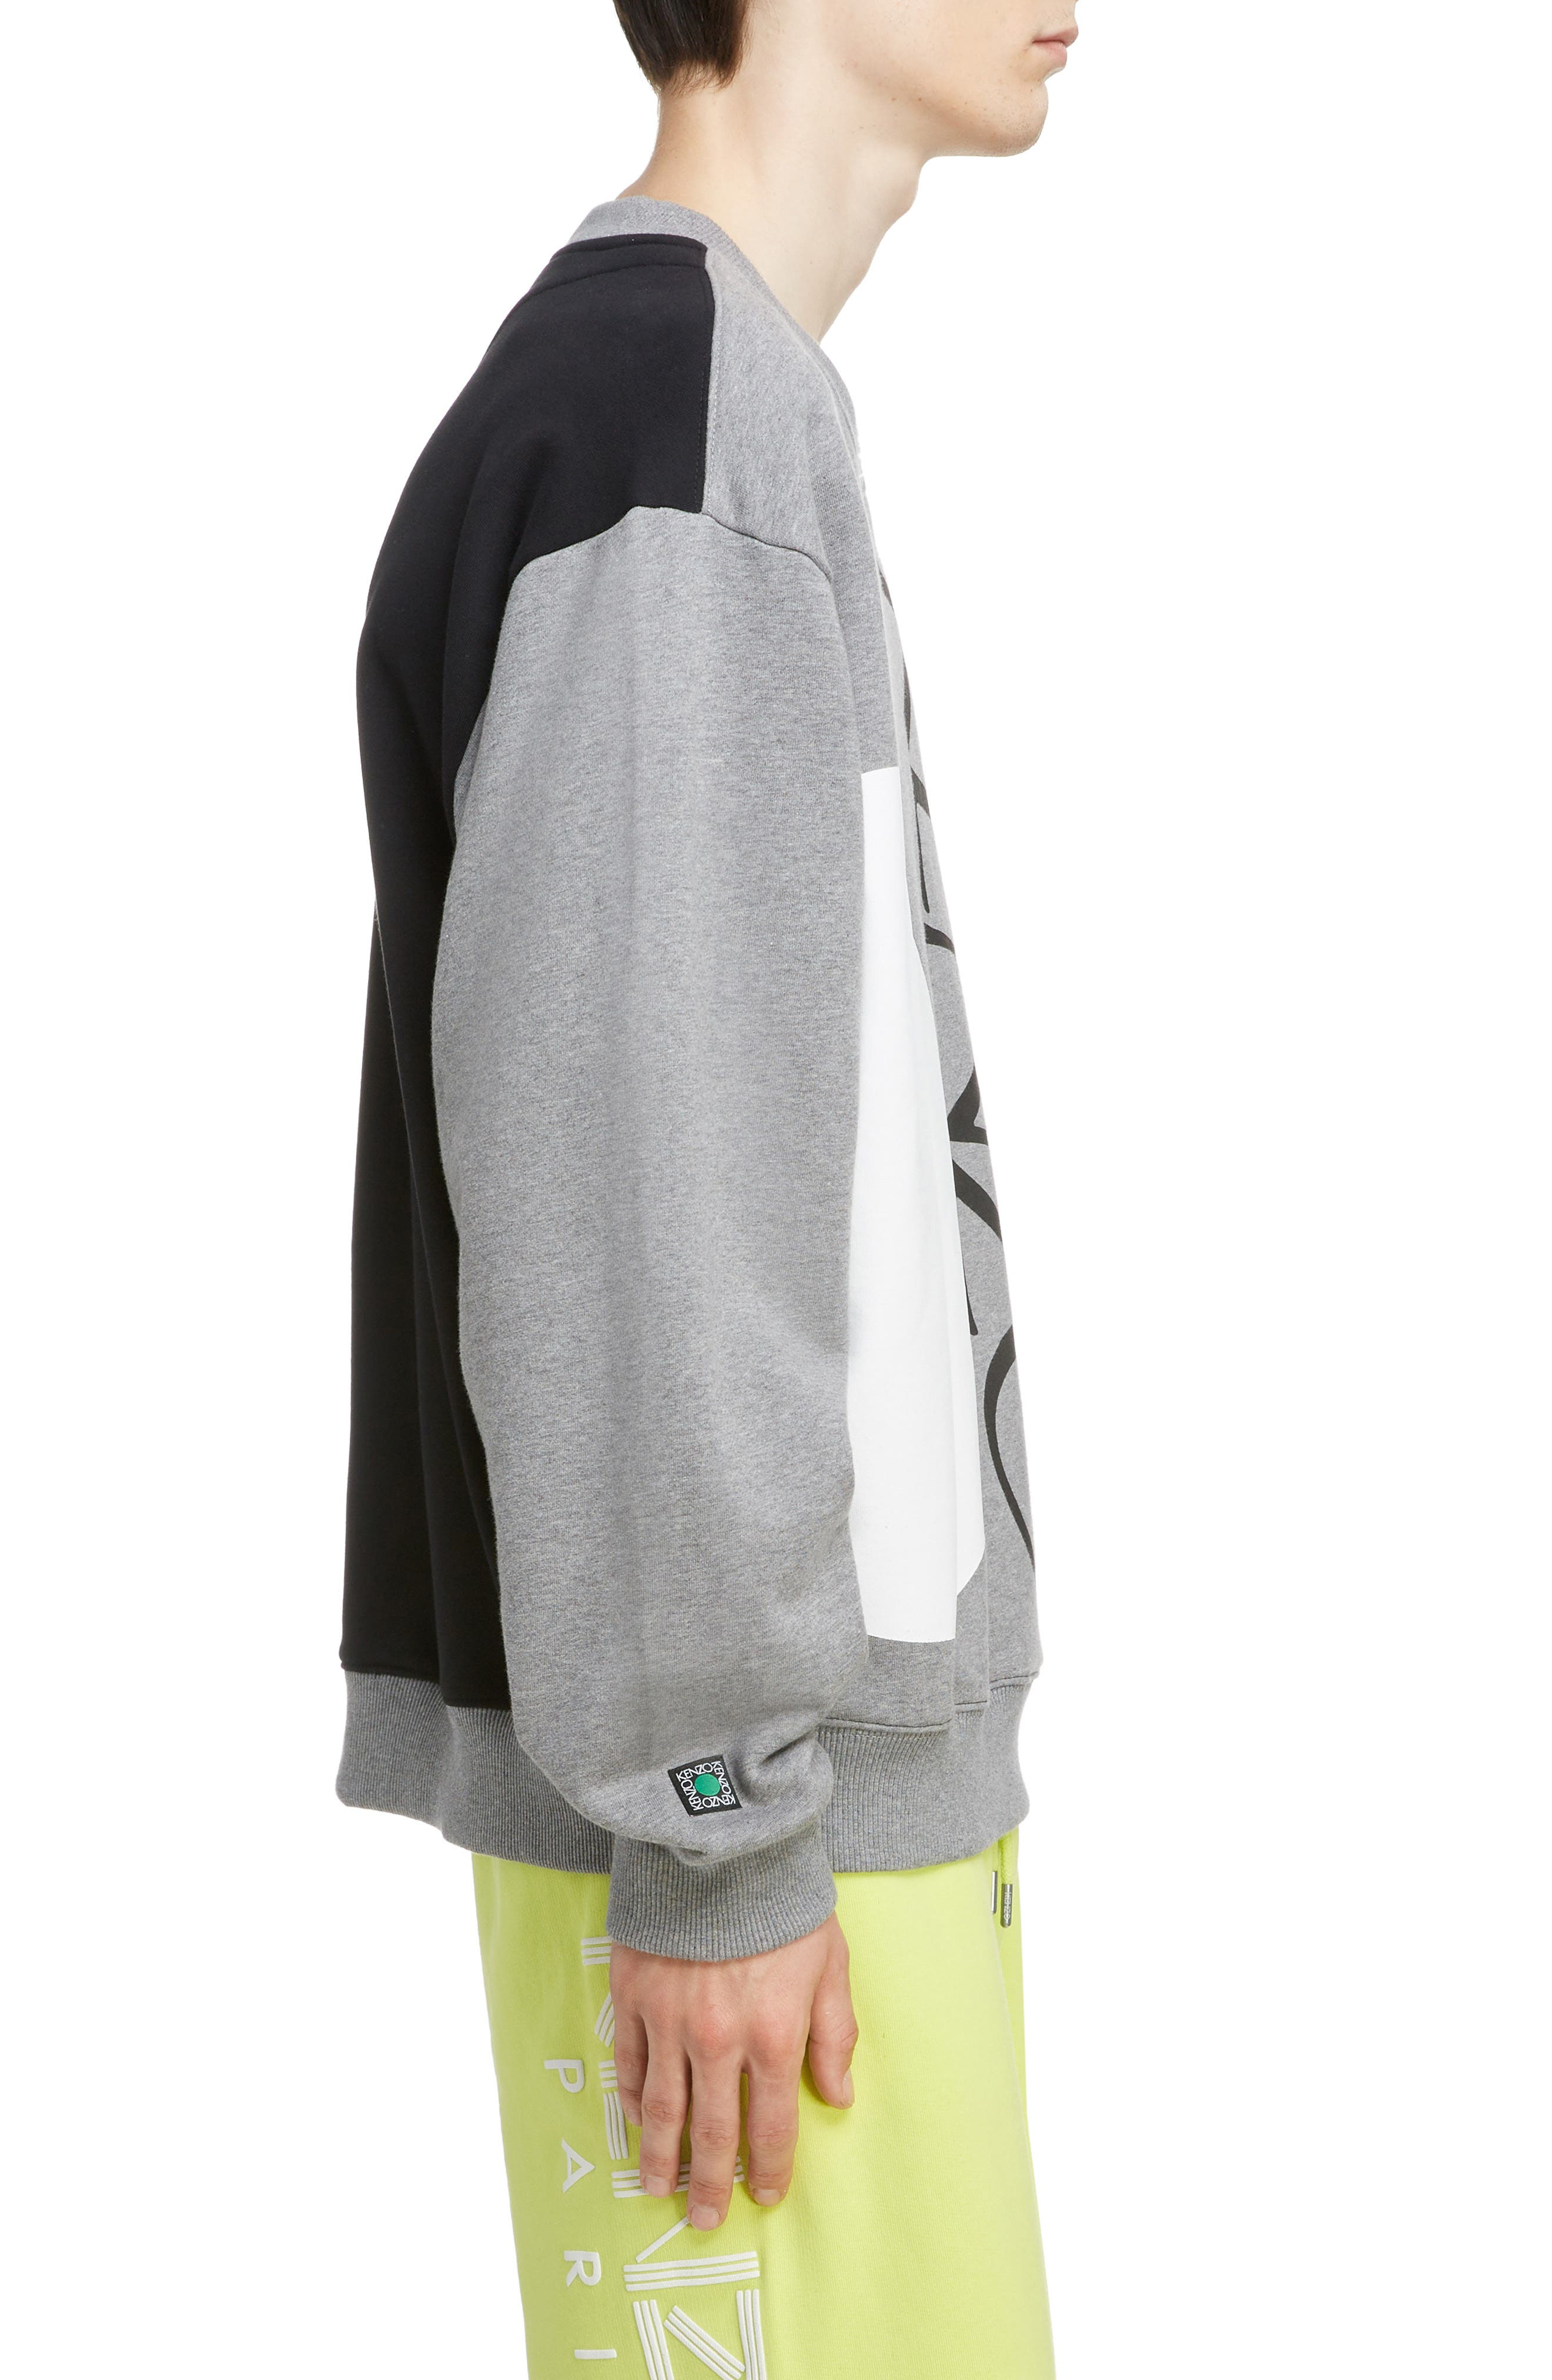 KENZO, Oversize Colorblock Sweatshirt, Alternate thumbnail 3, color, DOVE GREY